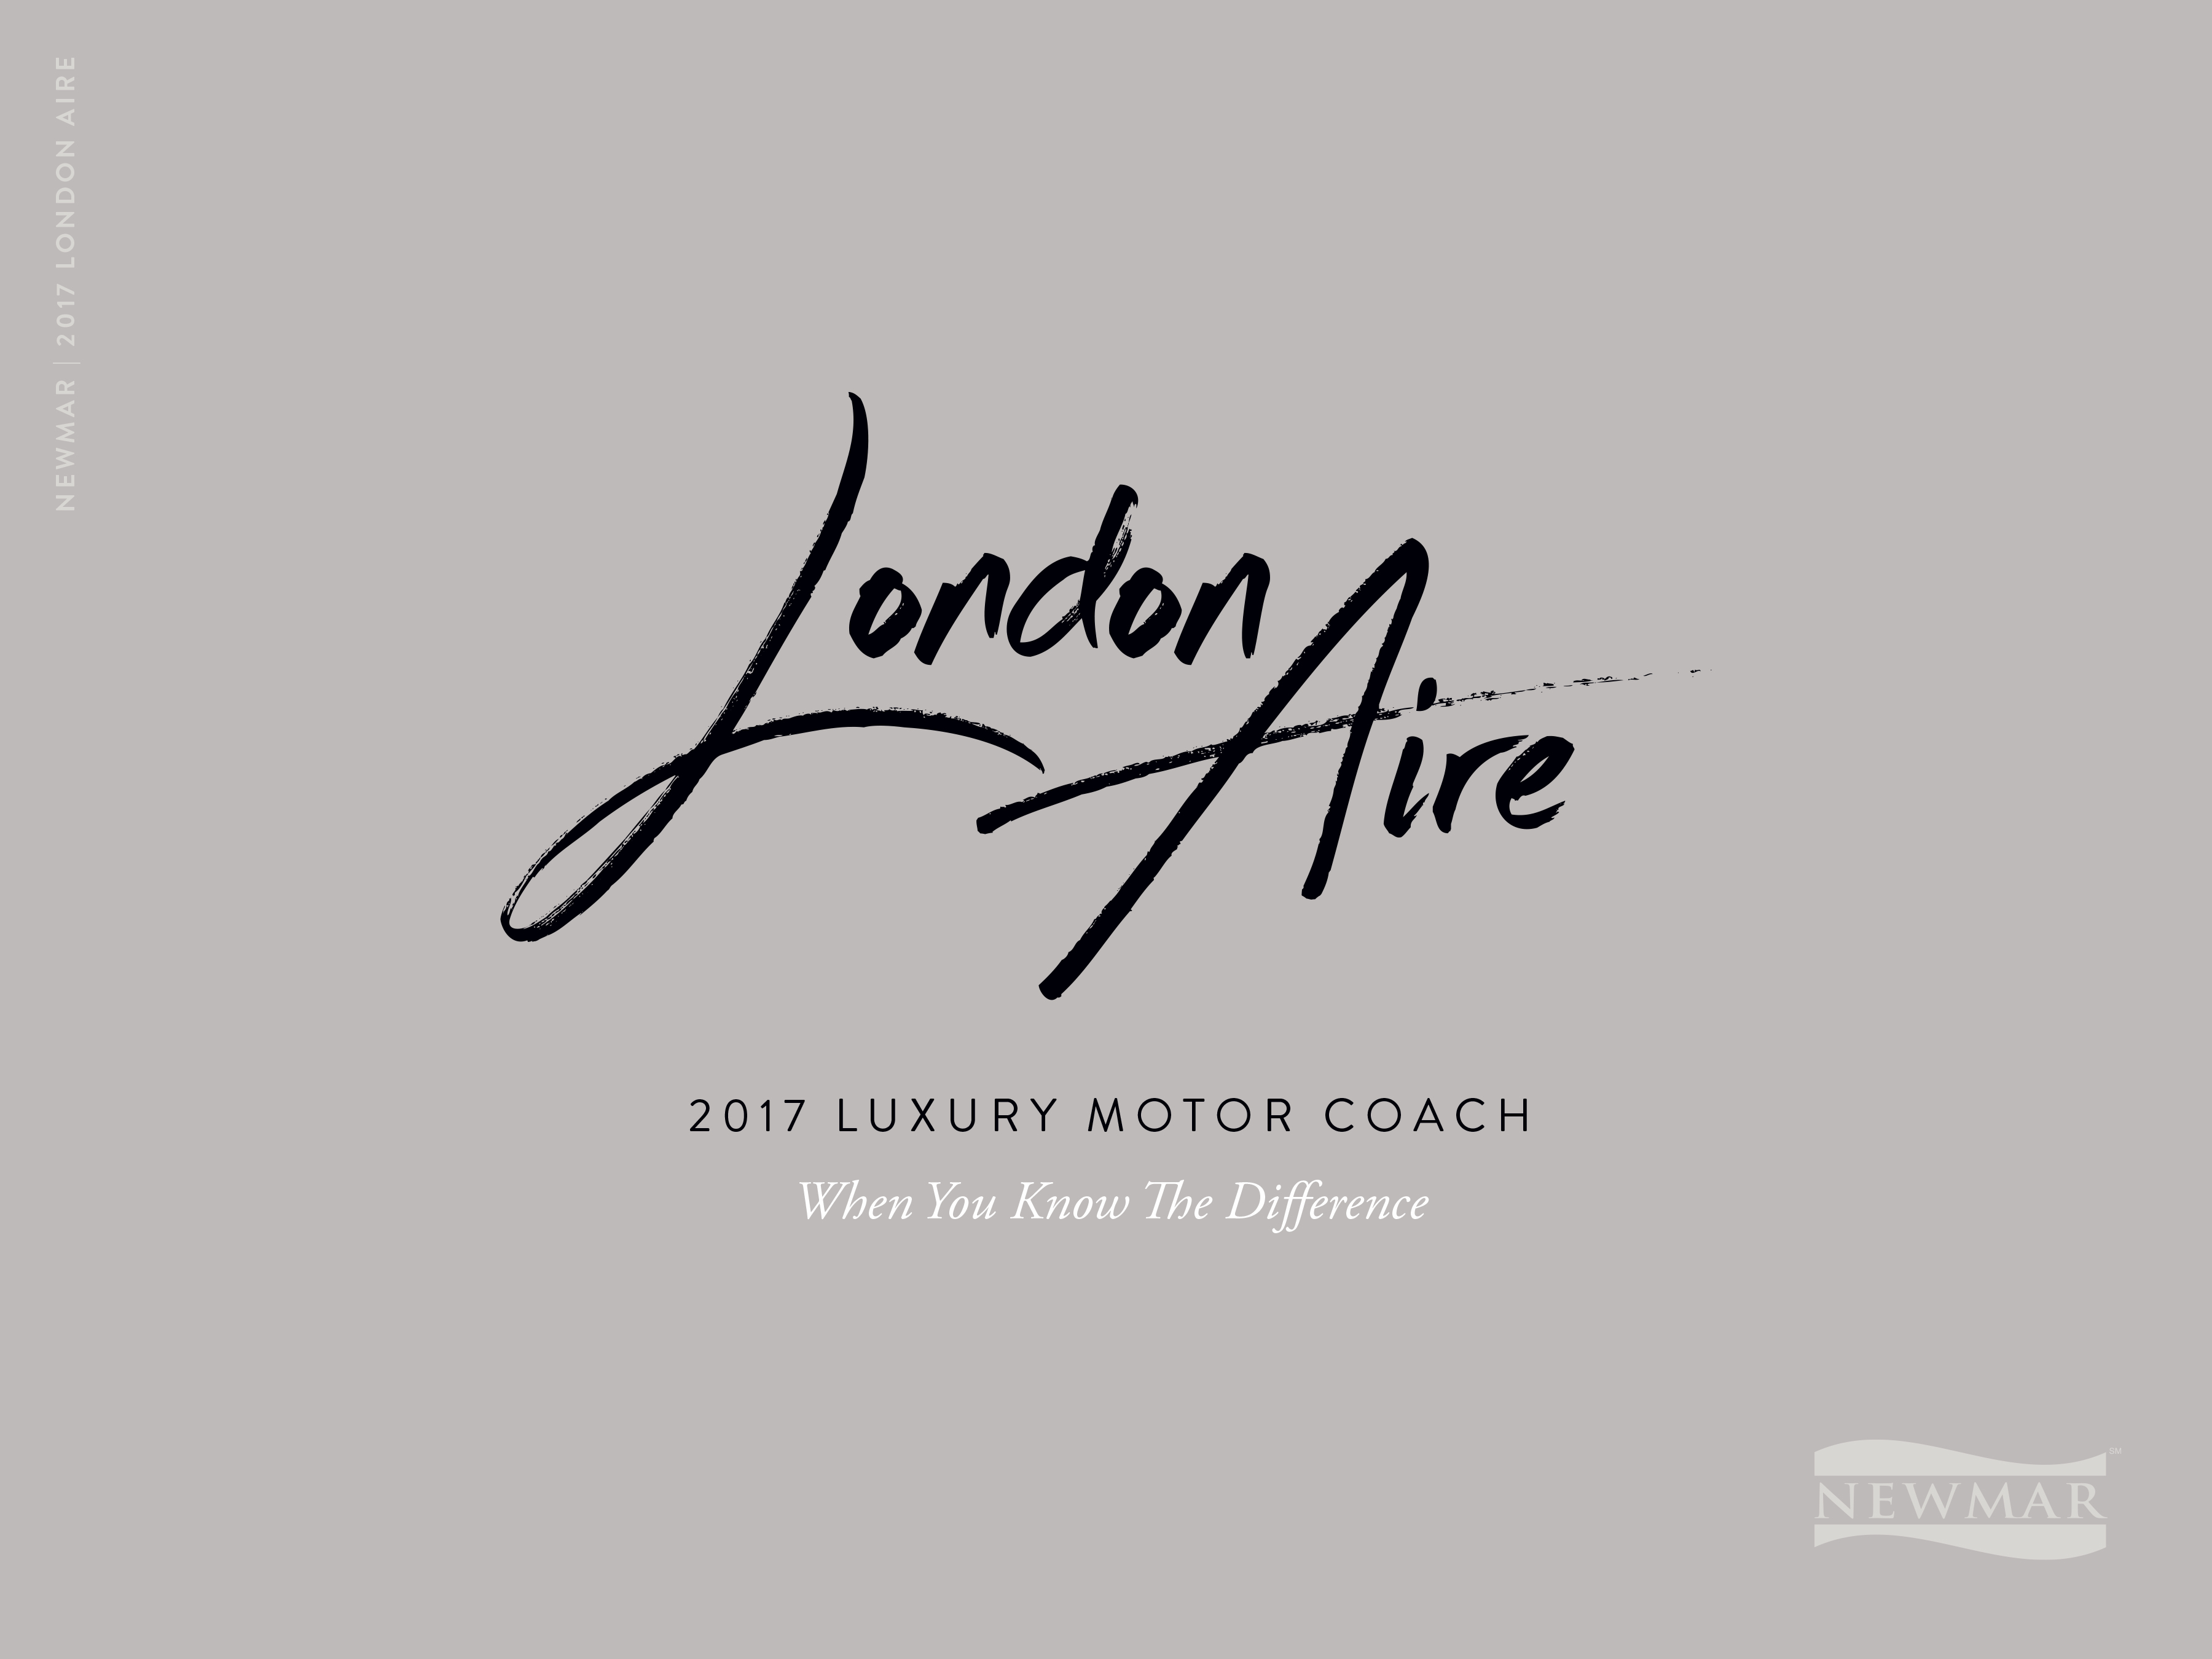 2017 London Aire